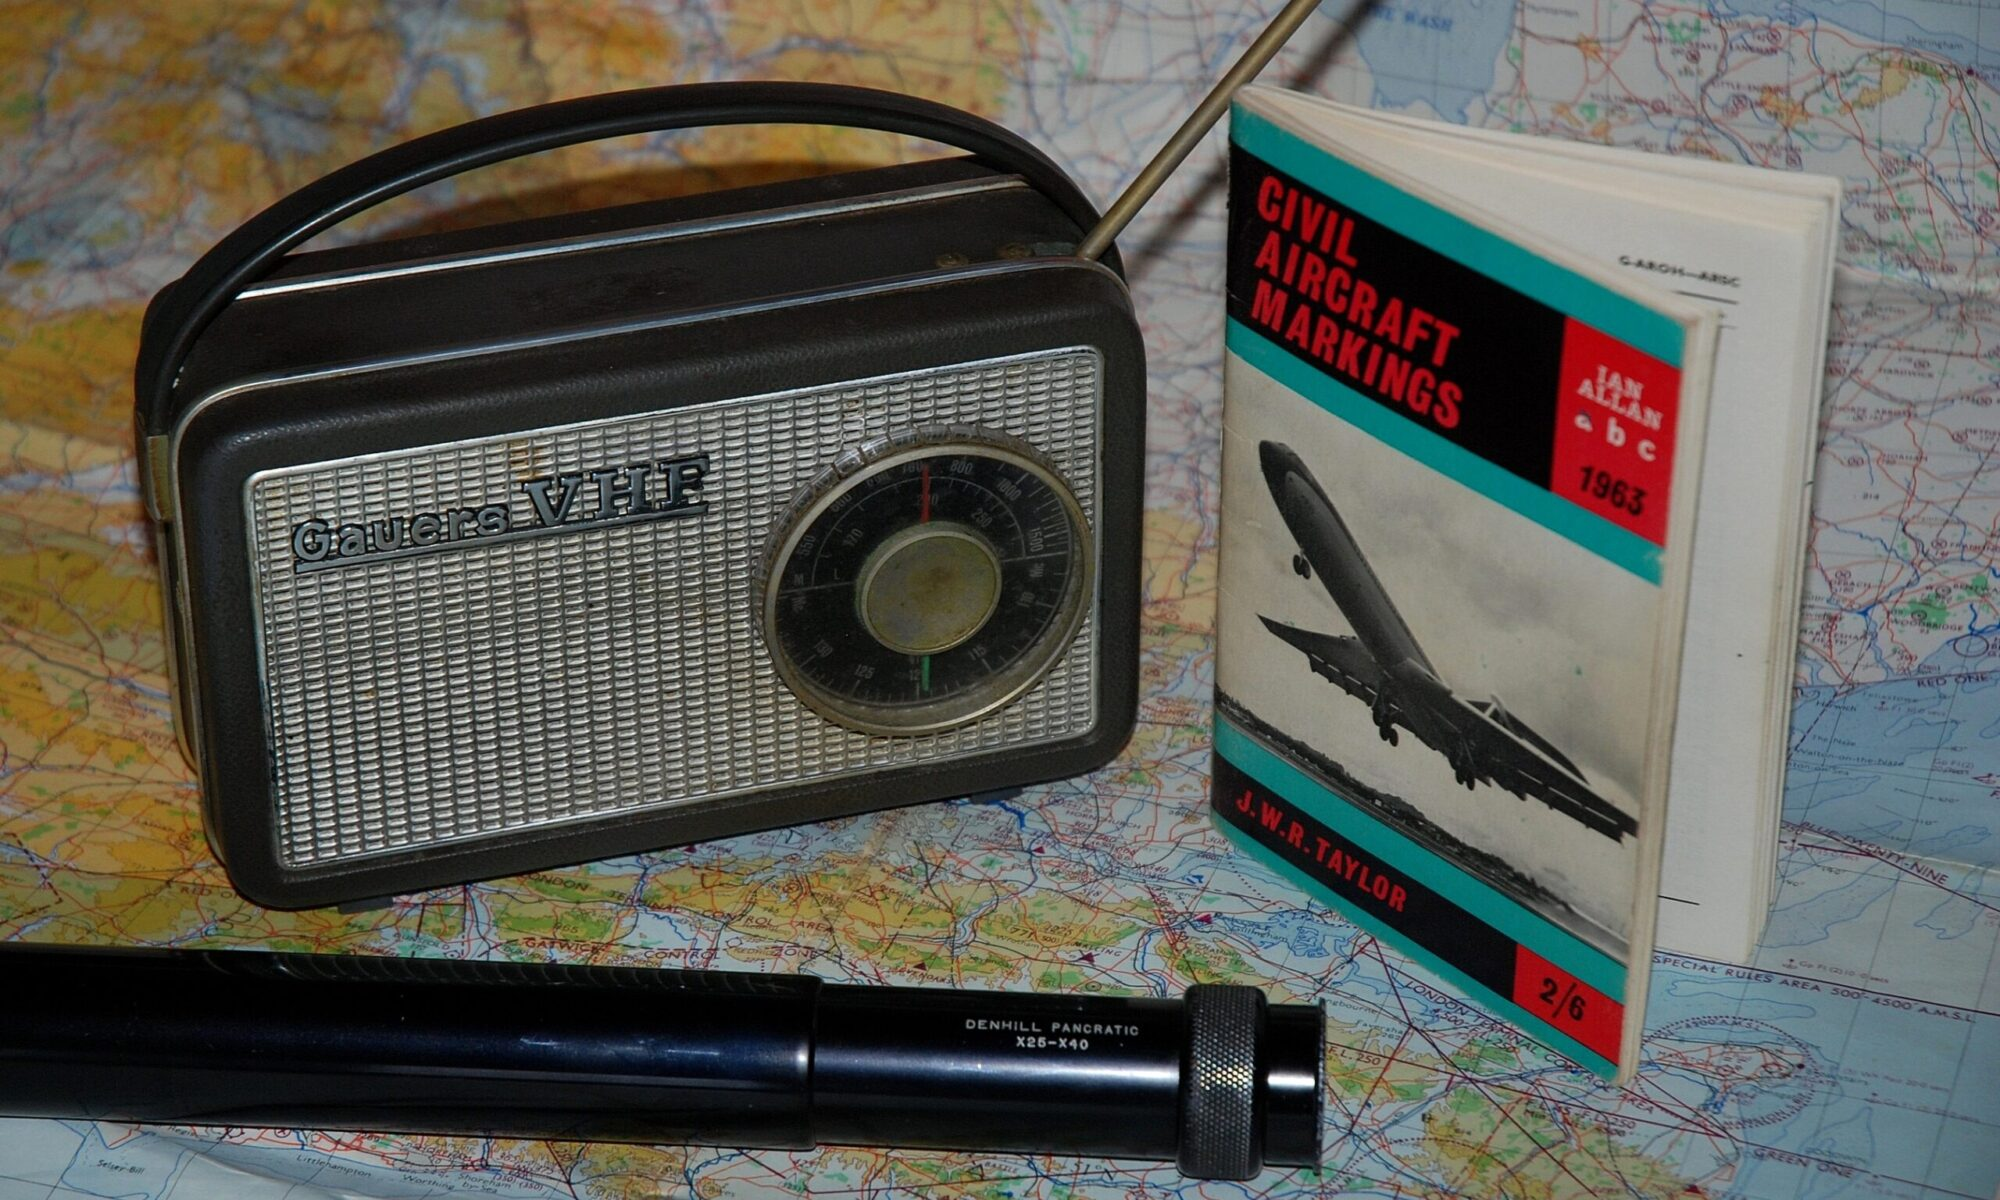 Airband Radio